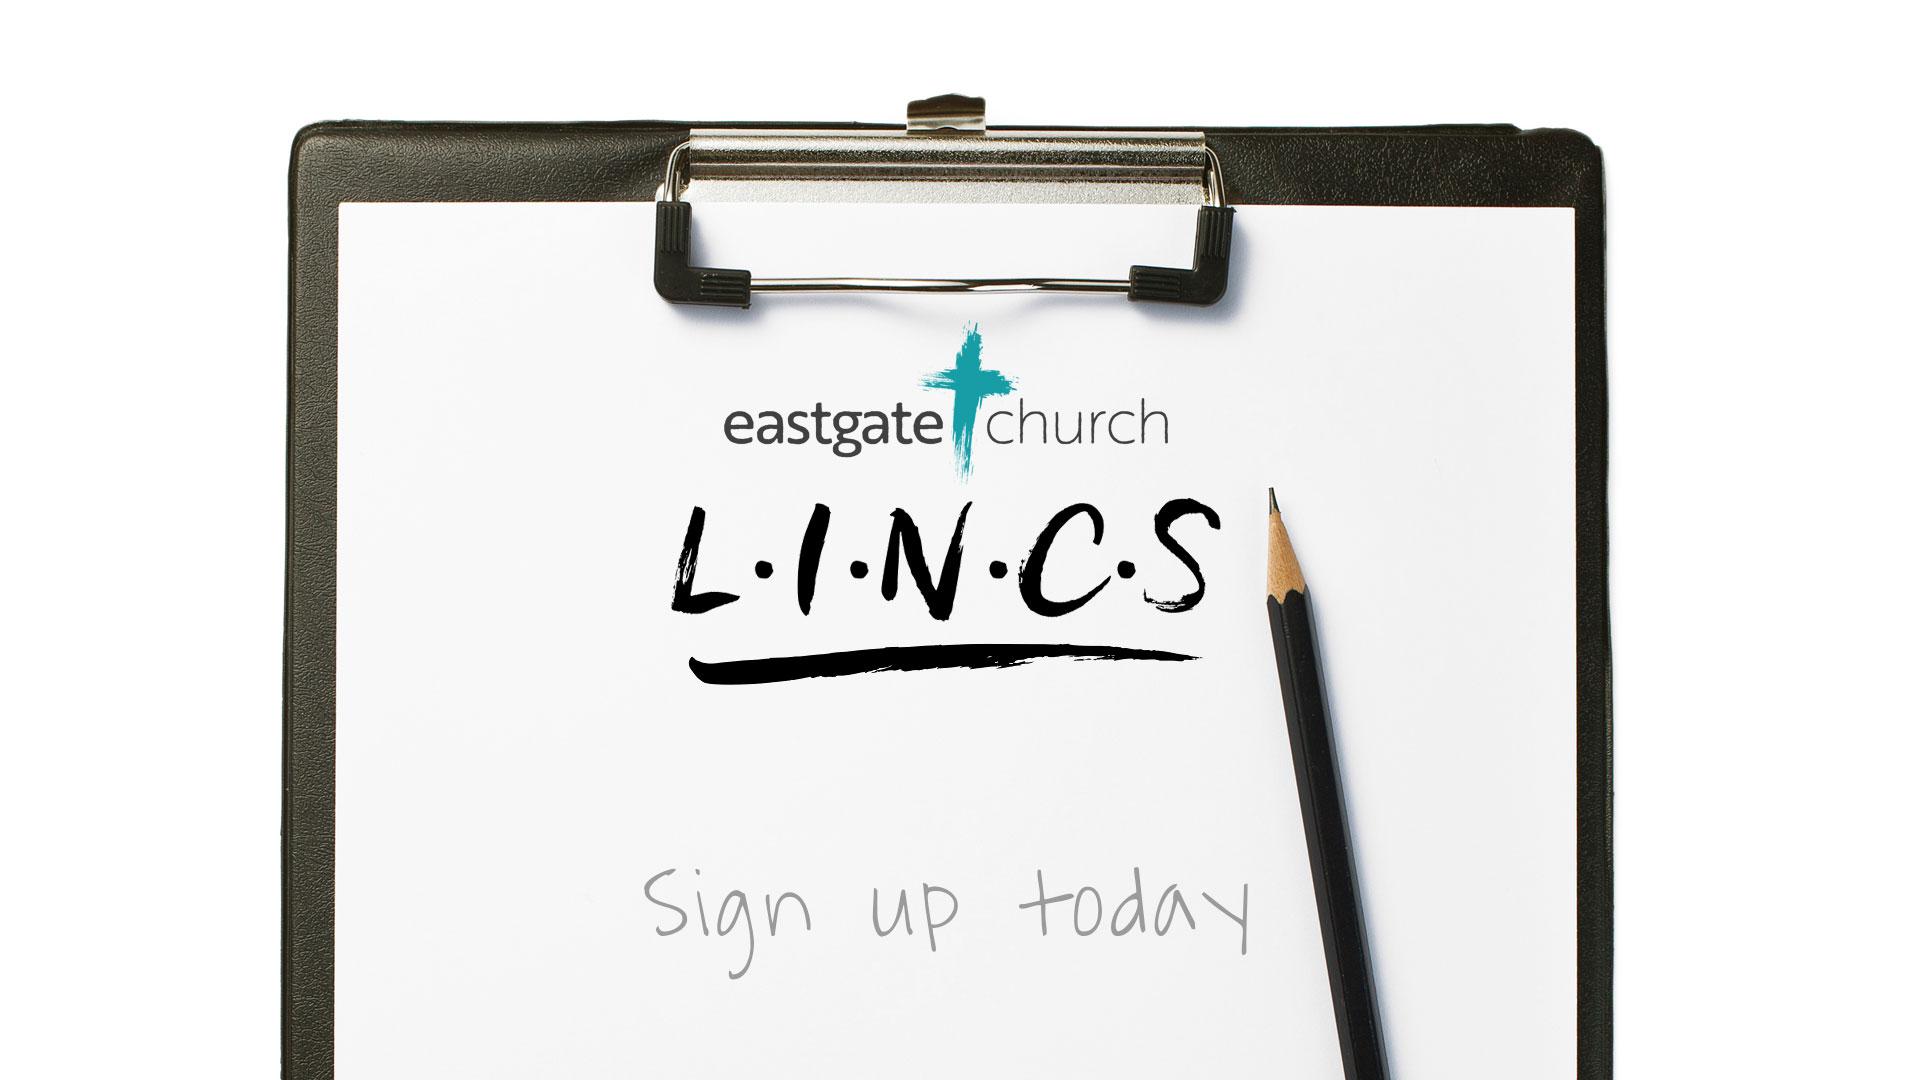 LINCS Signup